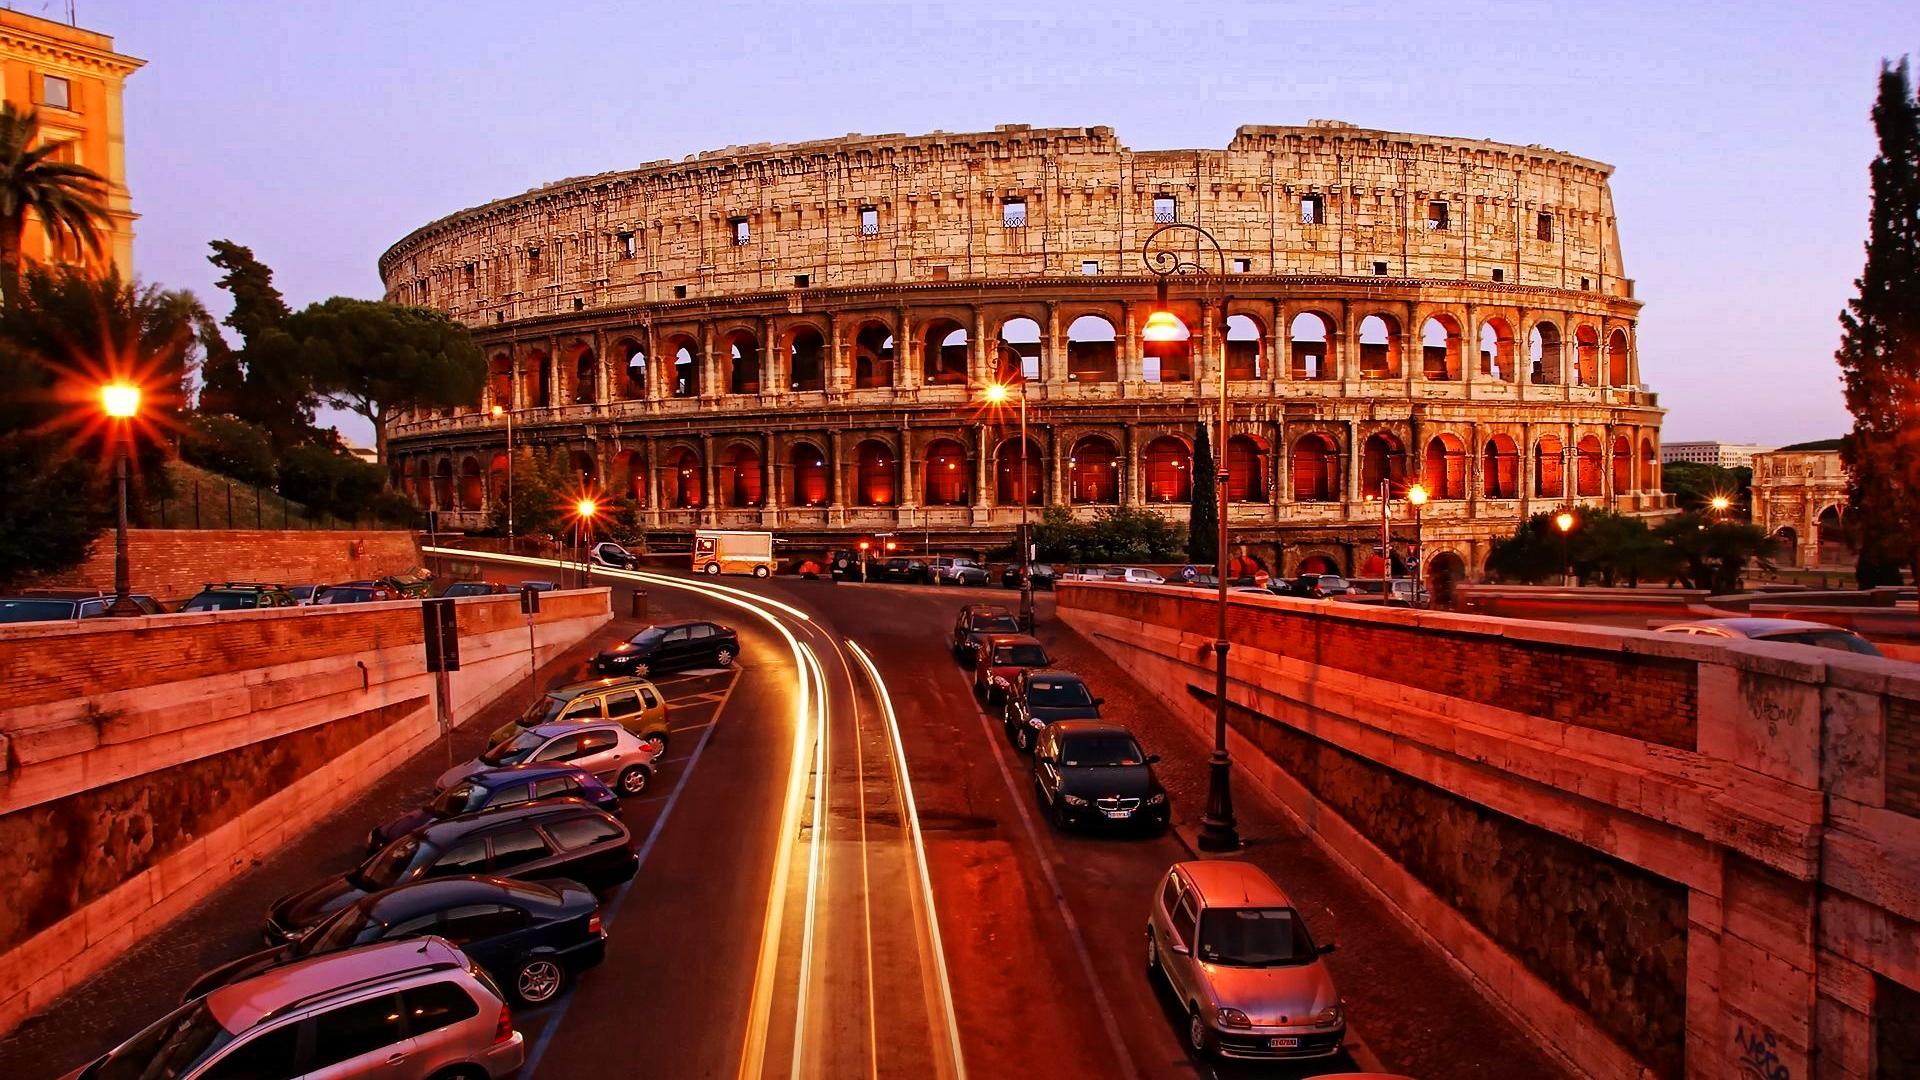 Colosseum la apus